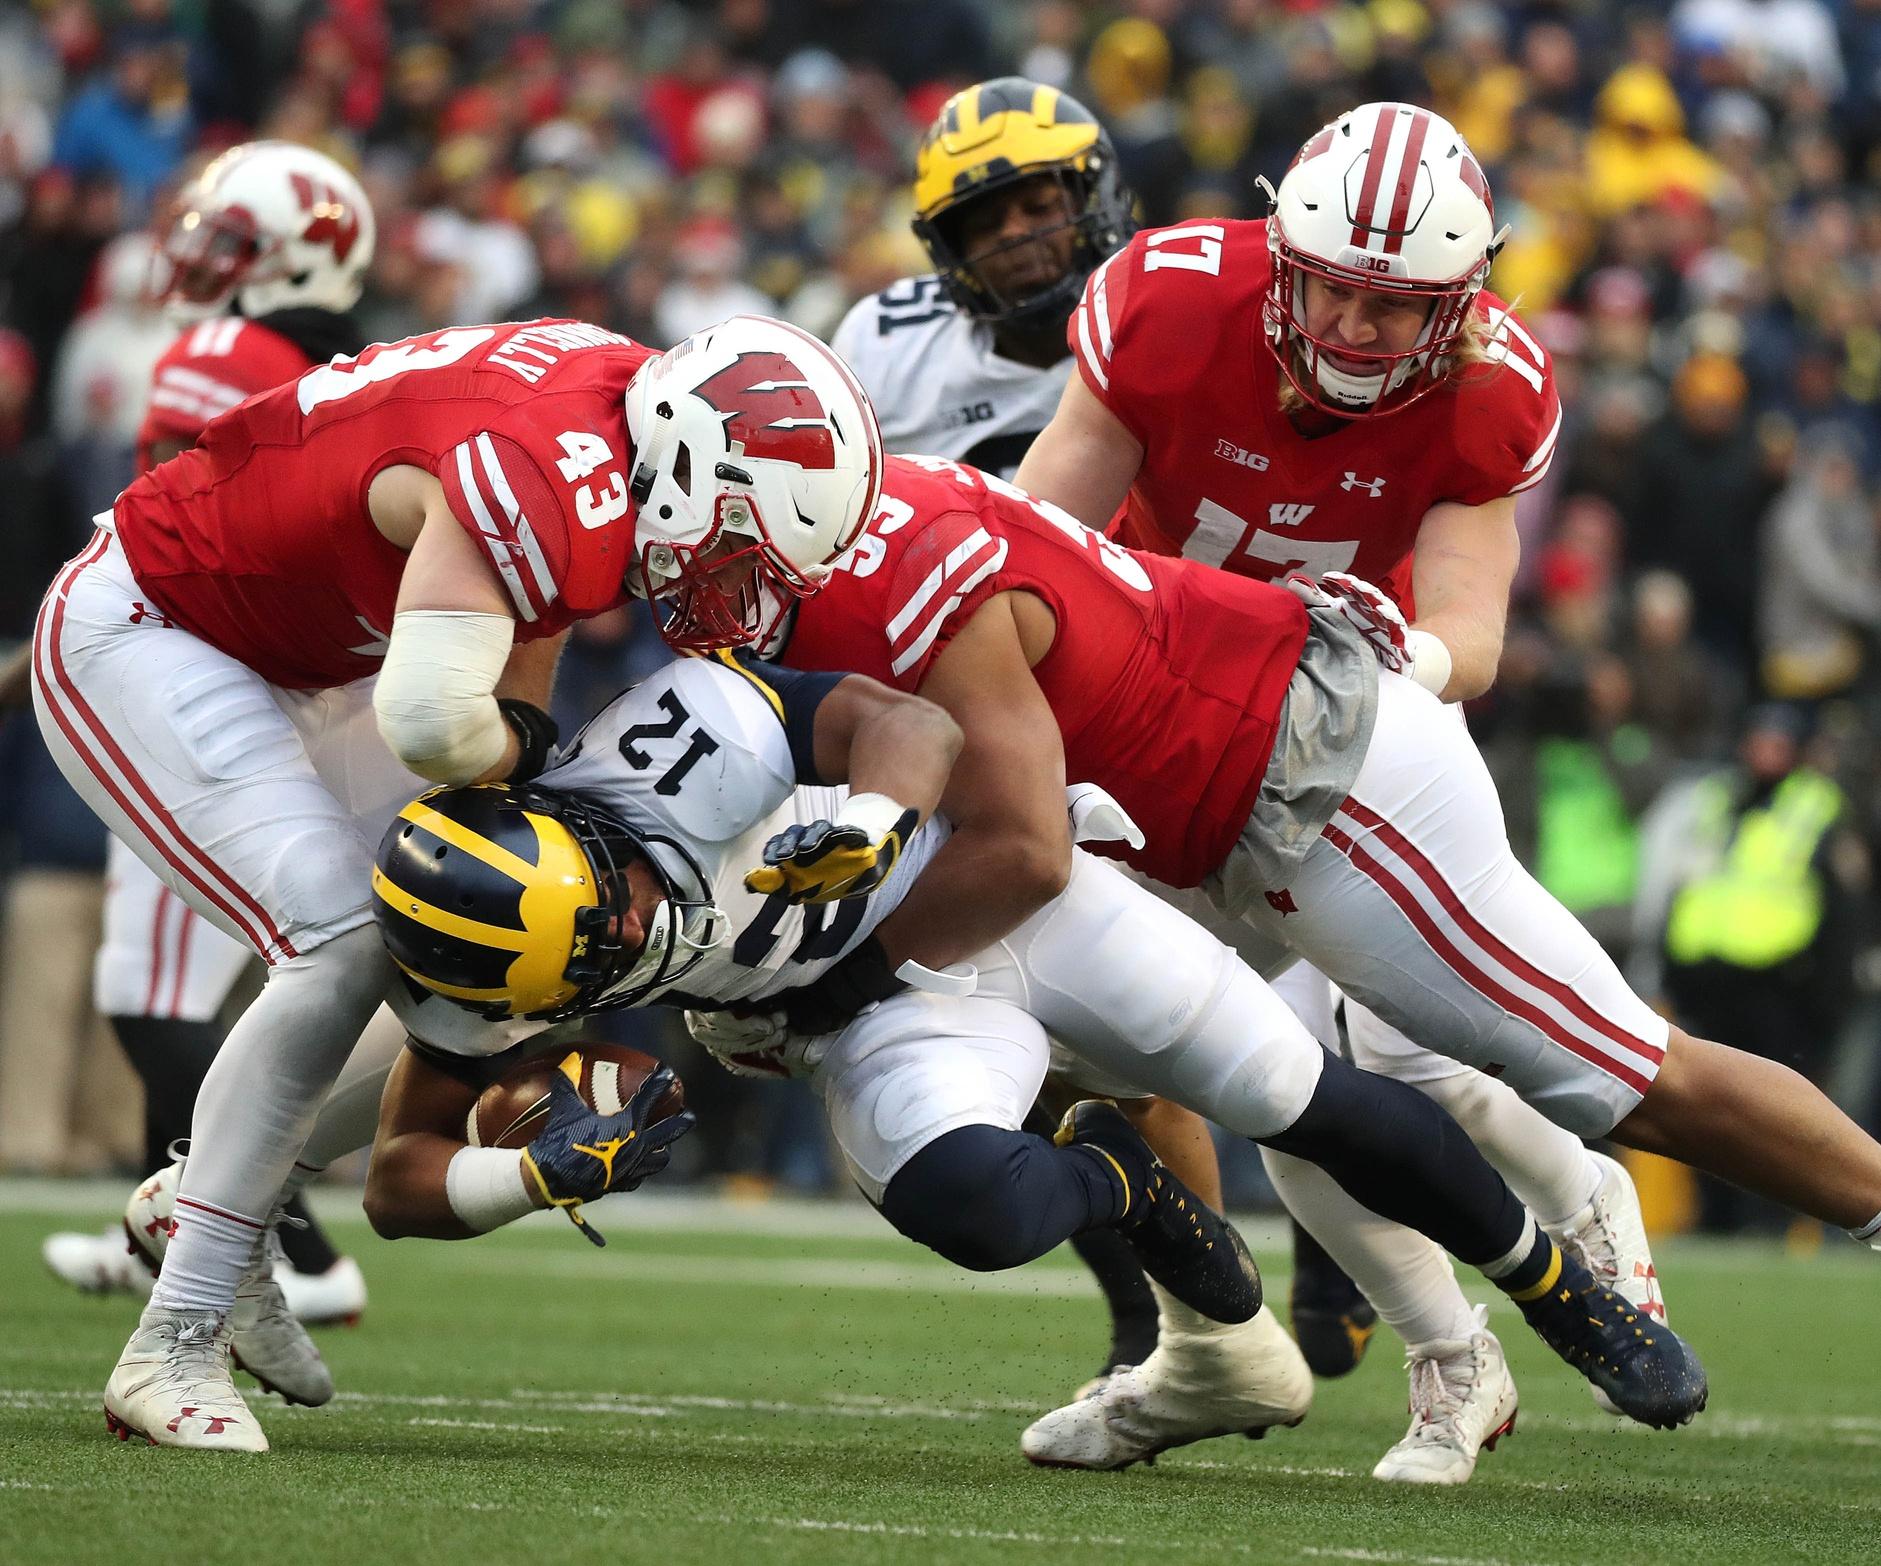 Michigan running back Chris Evans